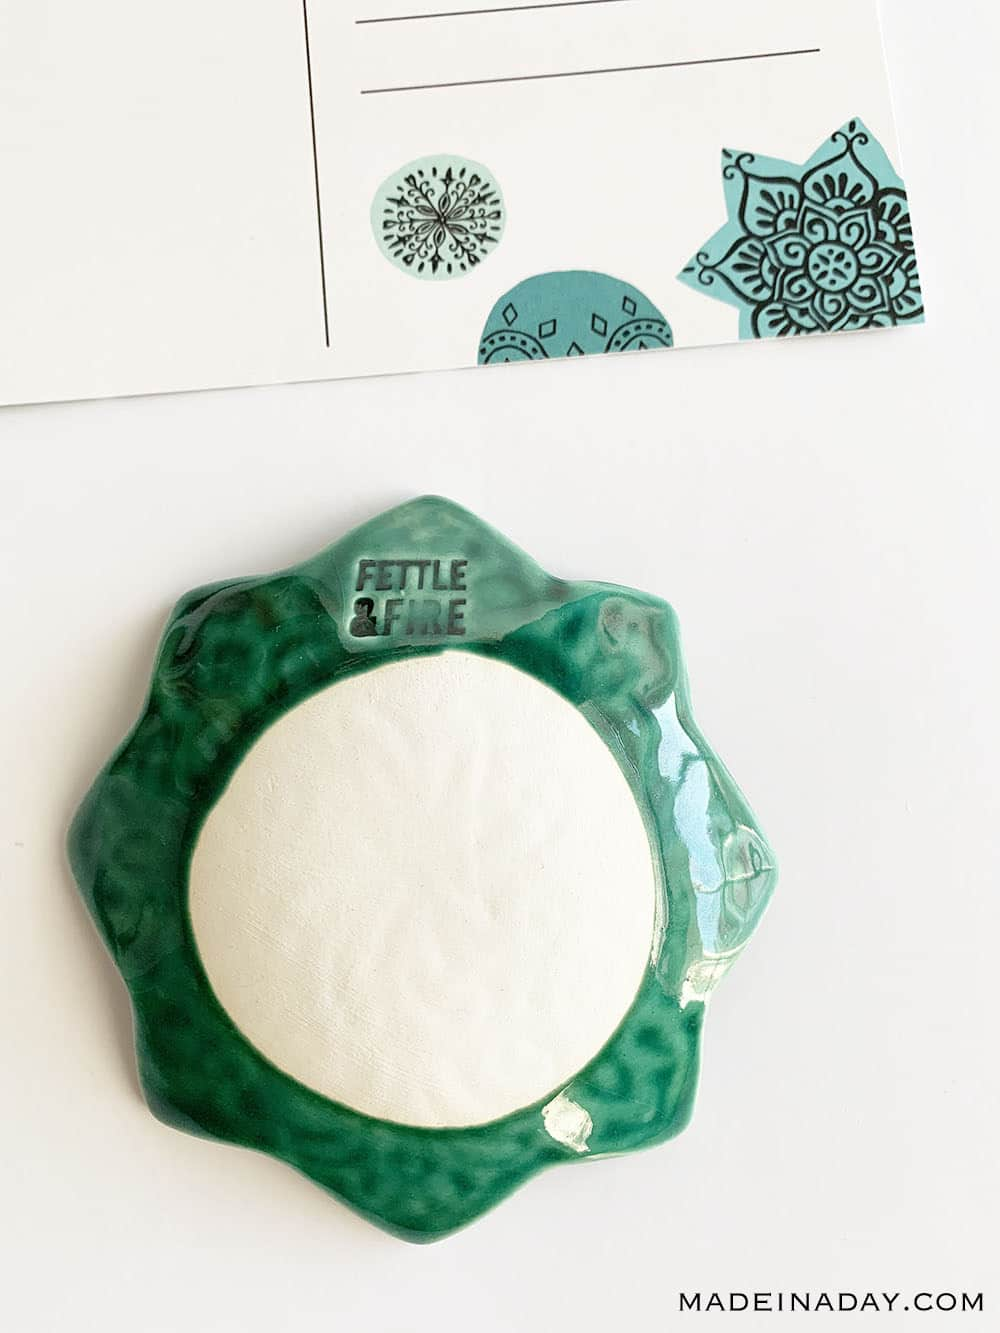 Fettle & Fire Trinket Dish, Amazon Handmade gift Idea